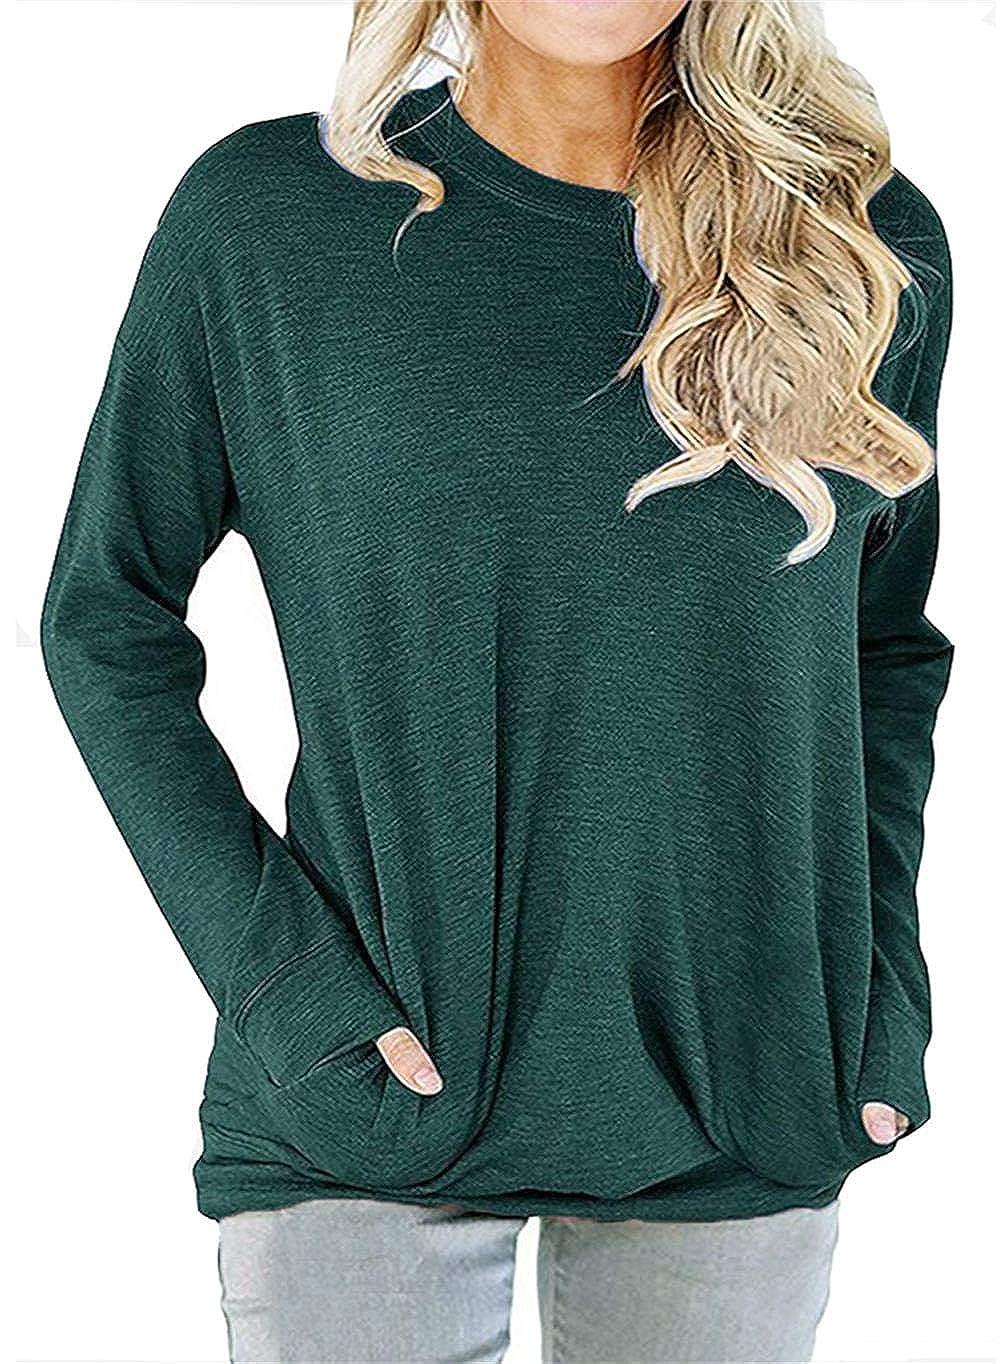 862238dc1b487e RJXDLT Women's Casual Long Sleeve Shirt Loose Soft Pockets Pullover Blouse  Tops Tunics at Amazon Women's Clothing store: